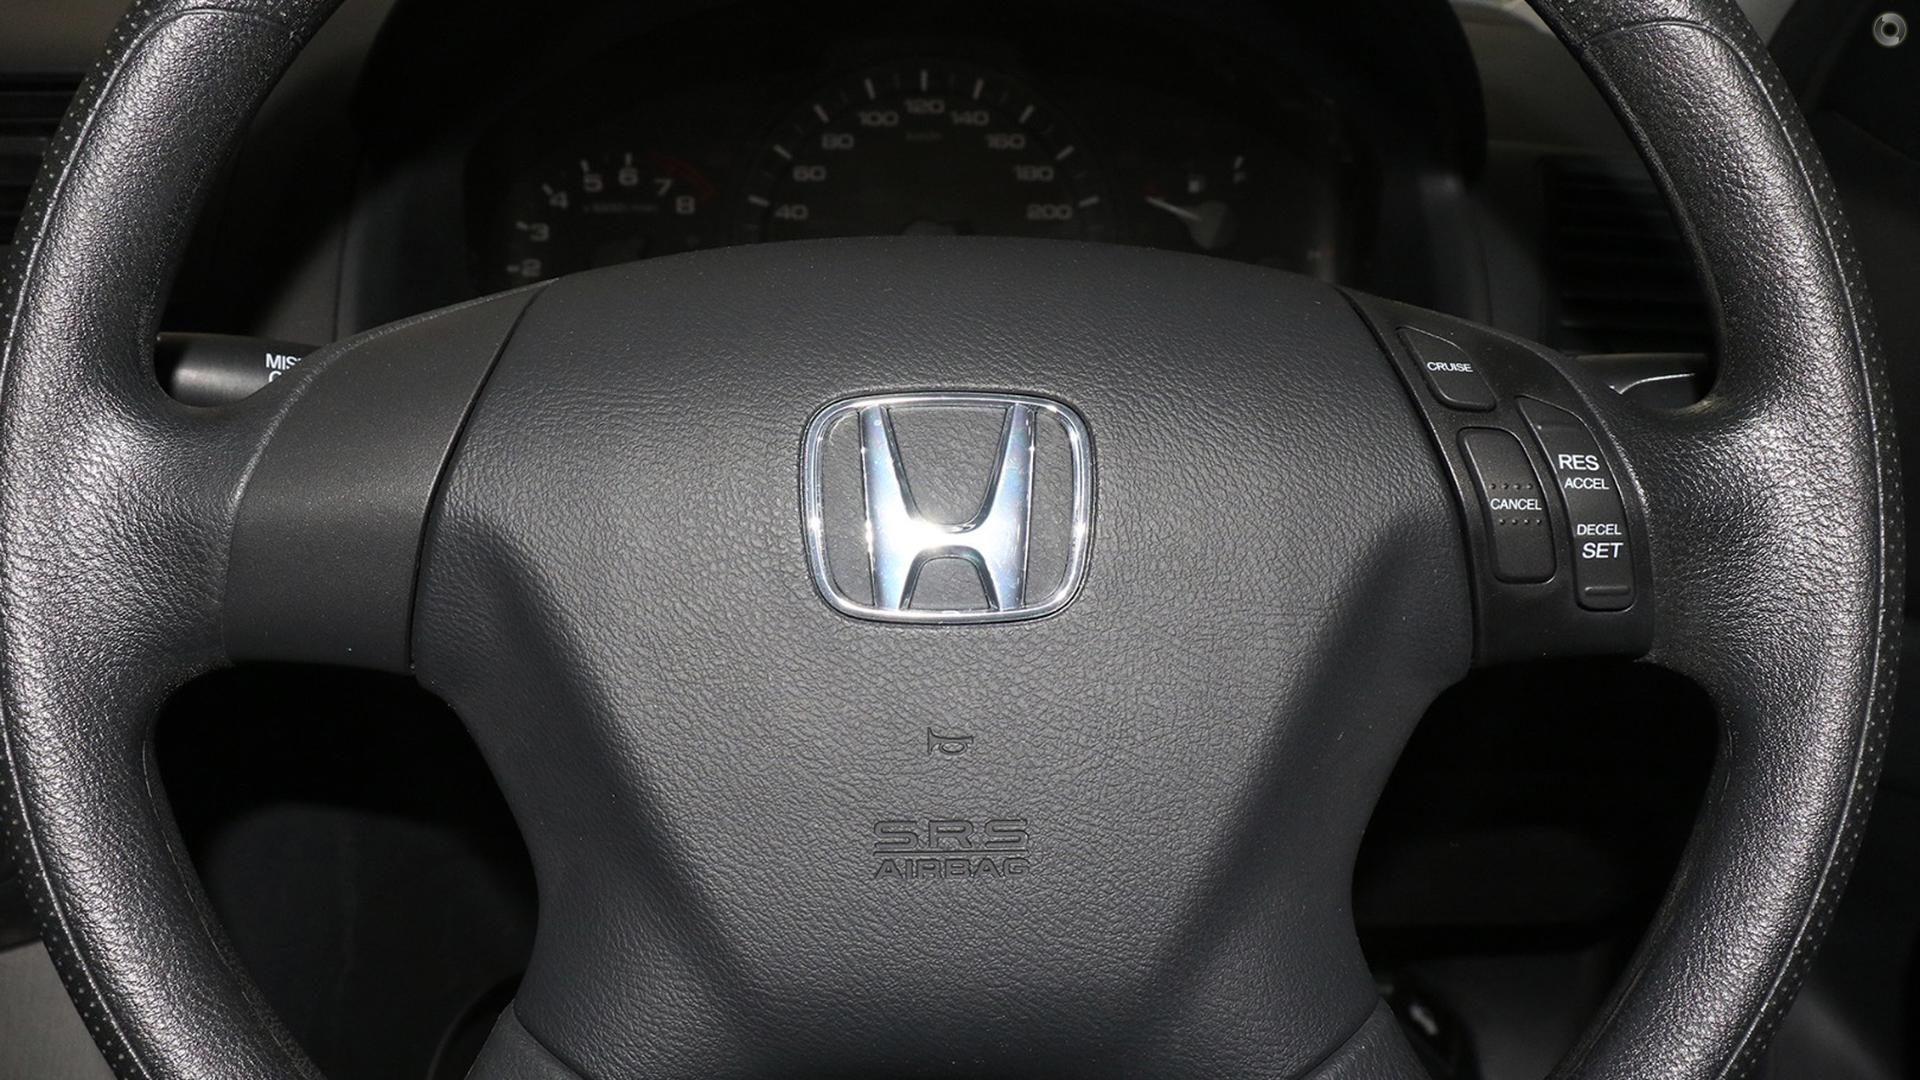 2007 Honda Accord VTi 7th Gen